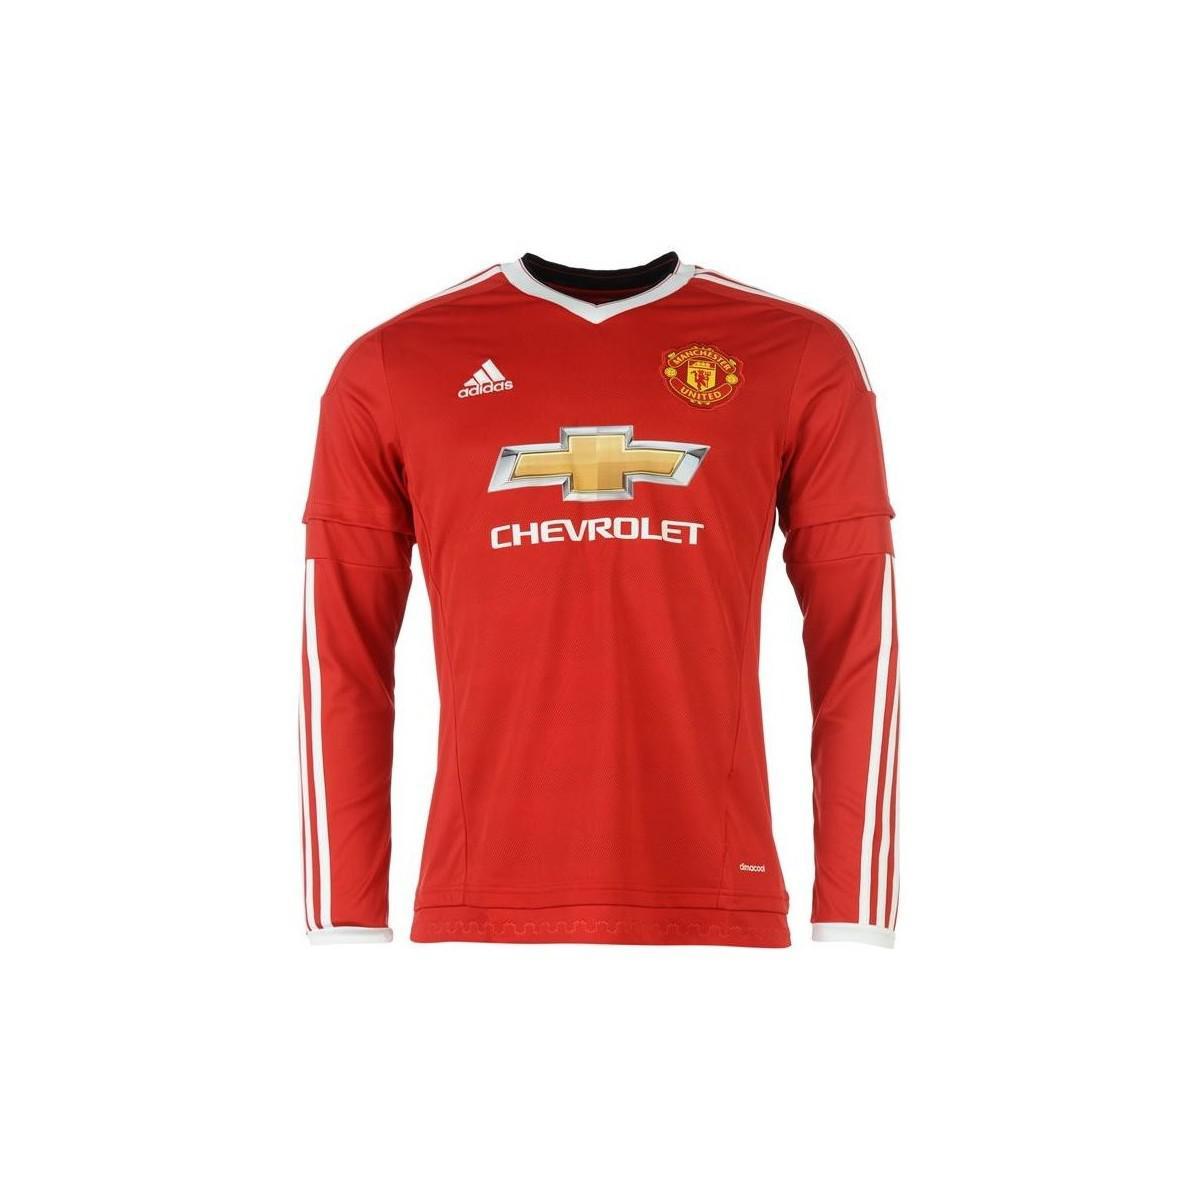 783ee16af Adidas - 2015-2016 Man Utd Long Sleeve Home Shirt (marcos Rojo 5). View  fullscreen